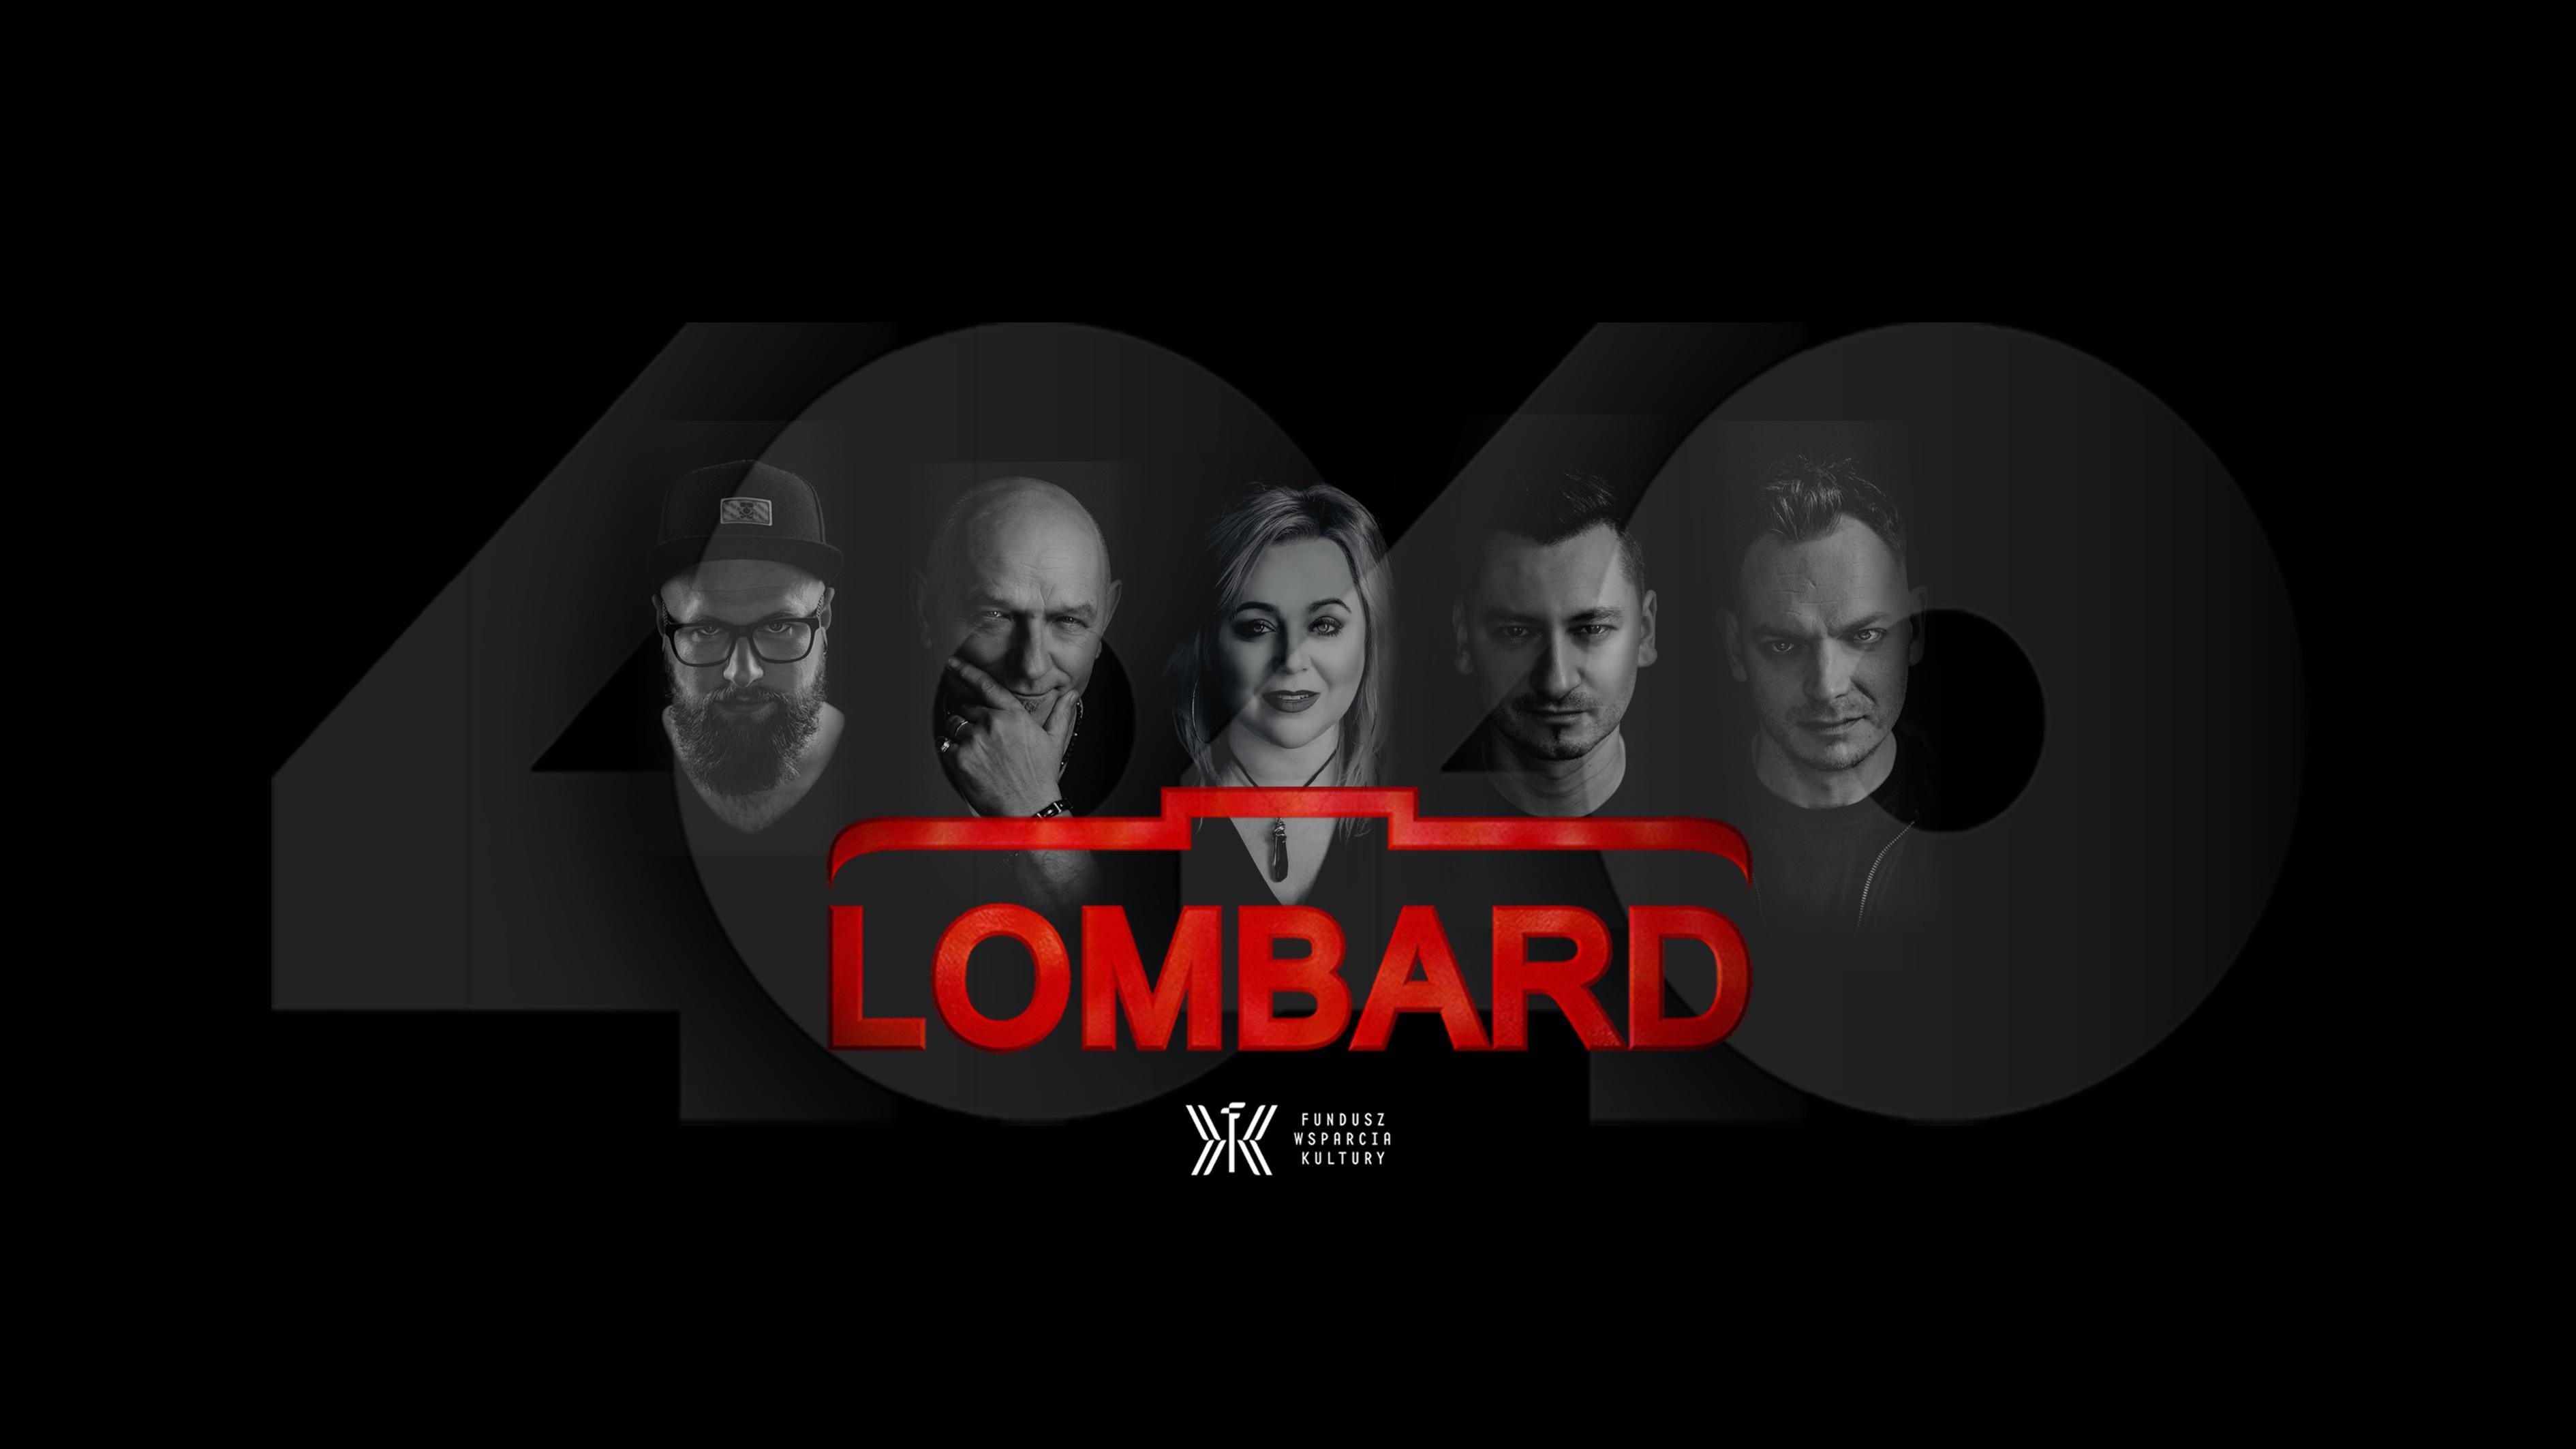 Lombard – 40/40 - Lombard